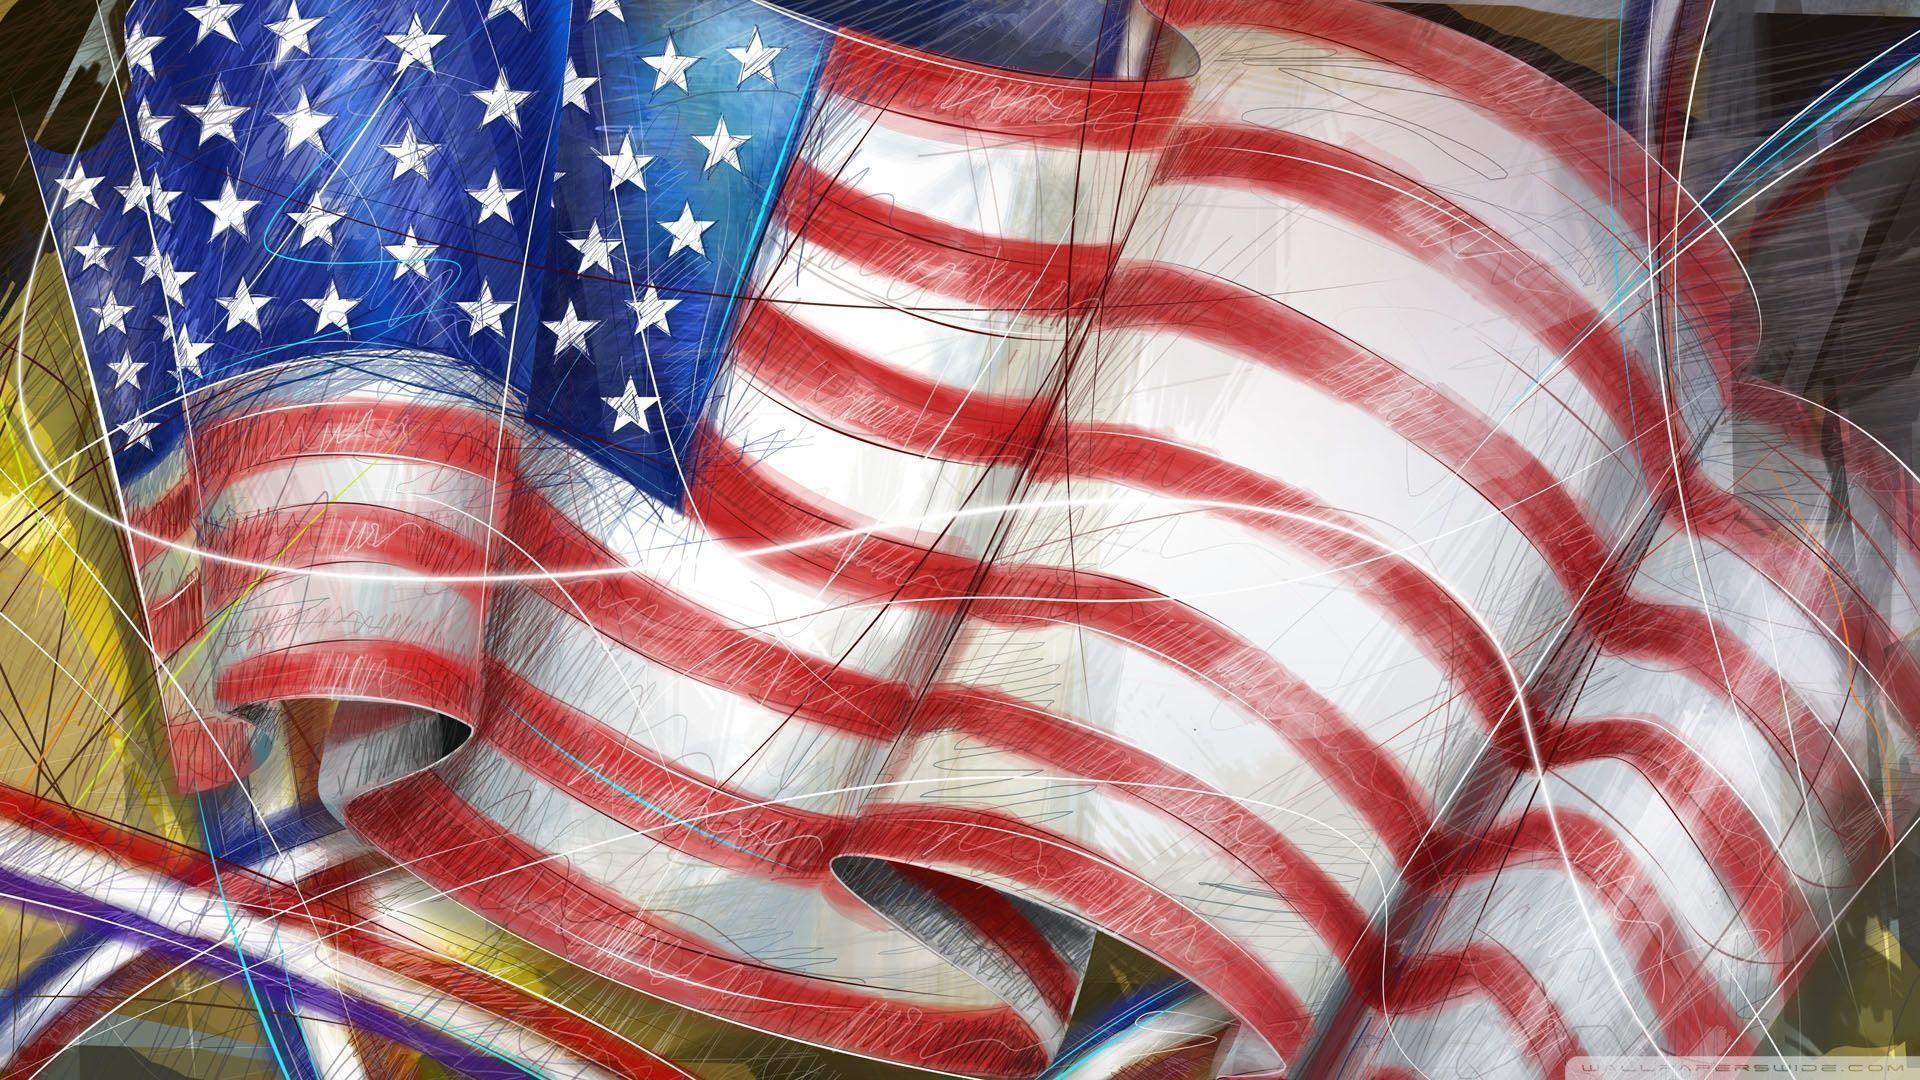 Res: 1920x1080, Usa Flag Wallpaper  - www.